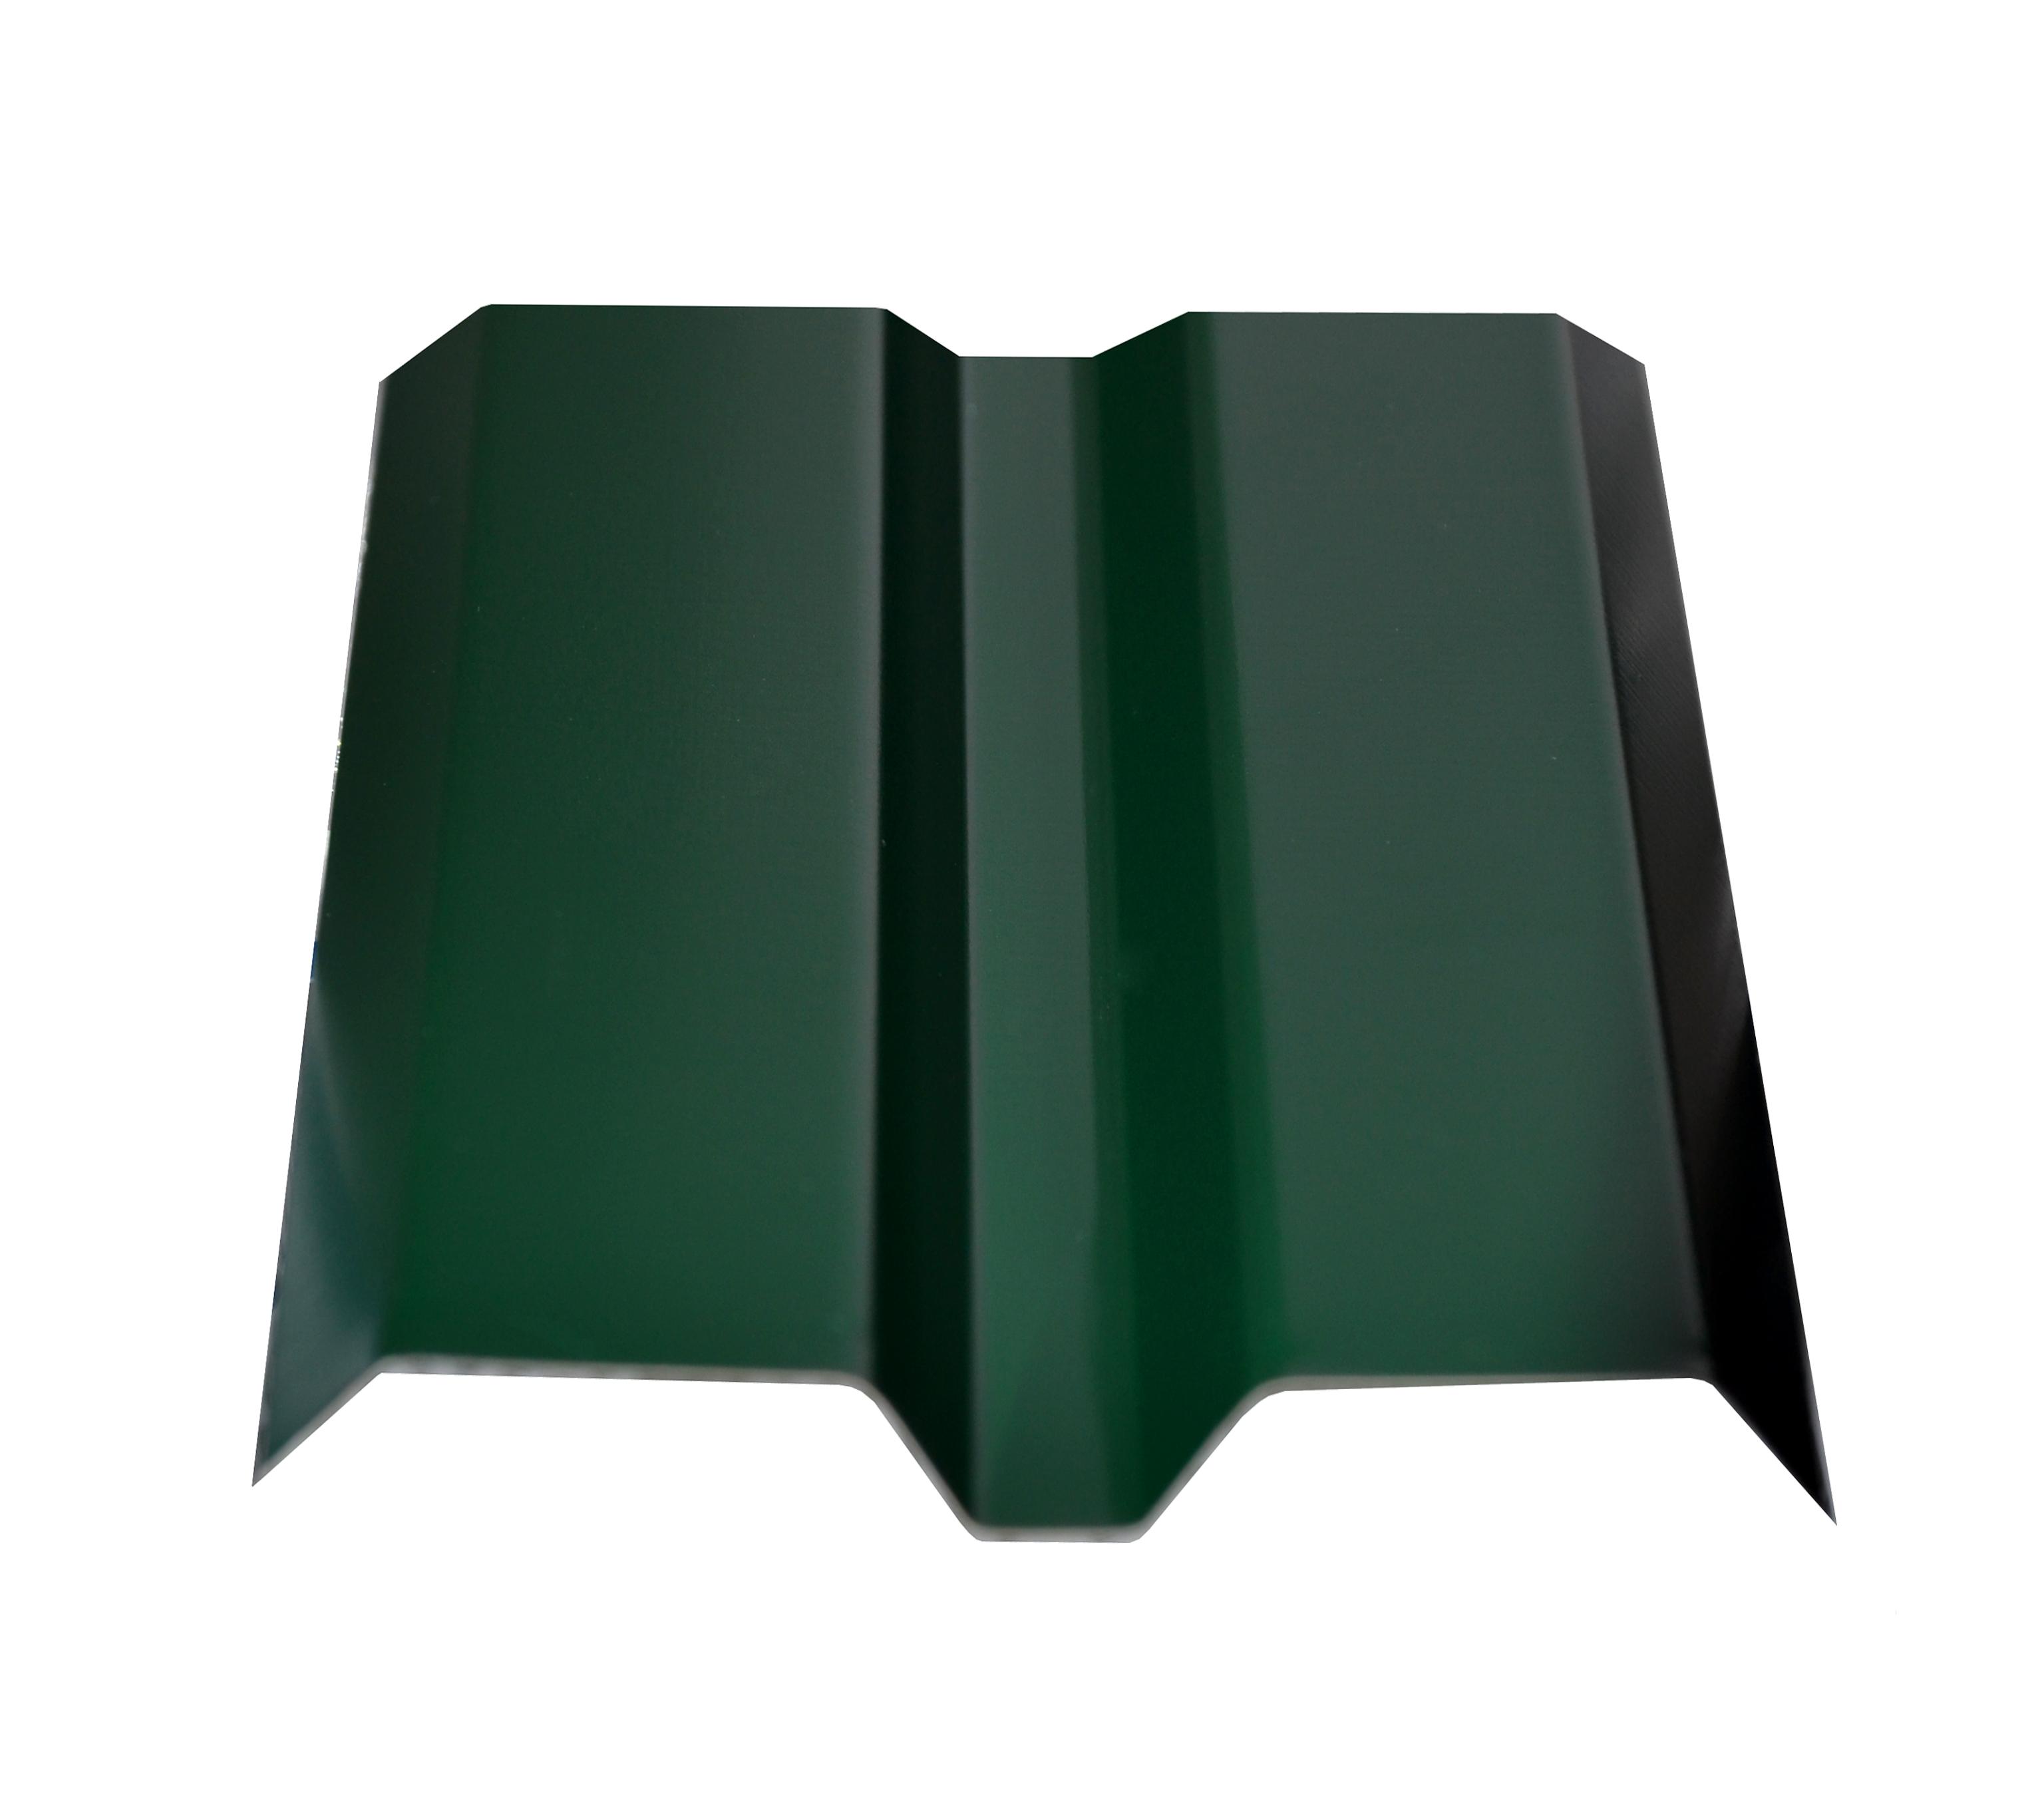 Евроштакетник  87х1500мм, толщина 0,4 мм зеленый